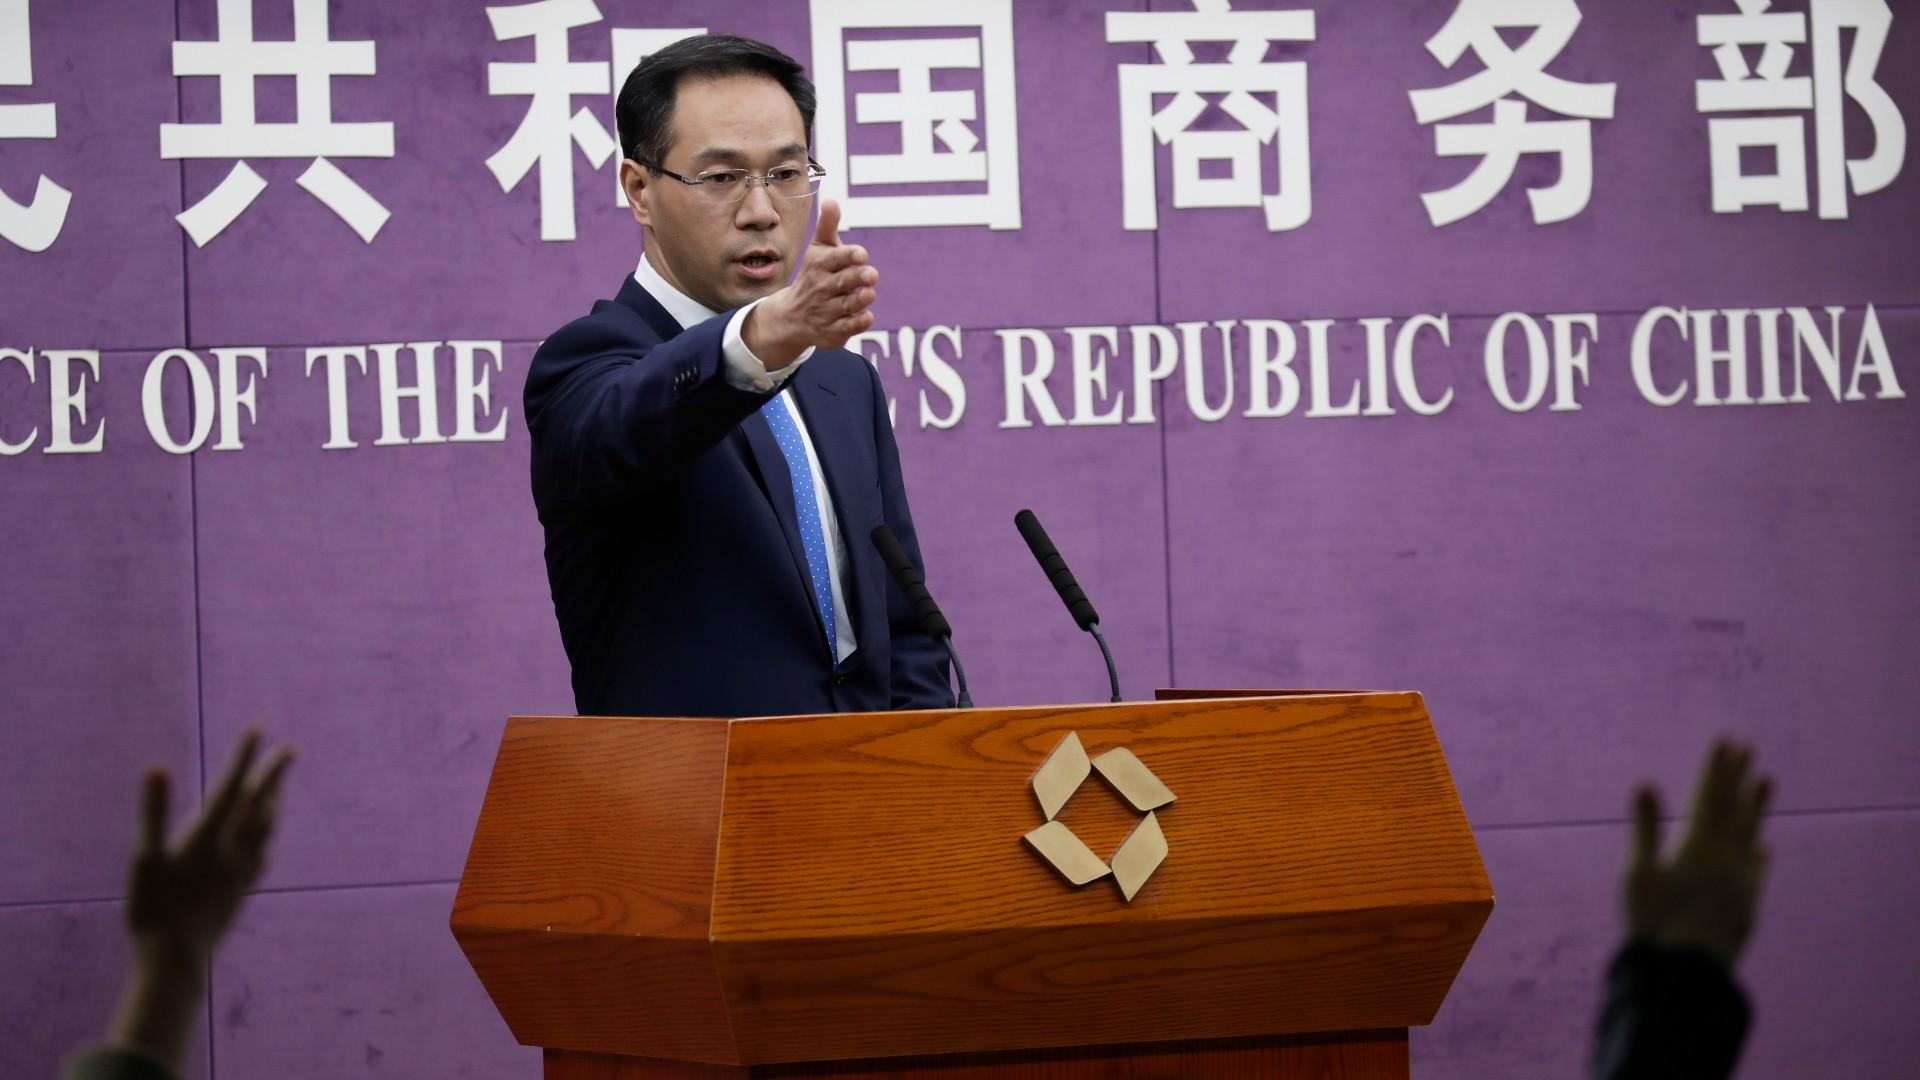 UK's Huawei ban betrays 'free-trade principles,' says China